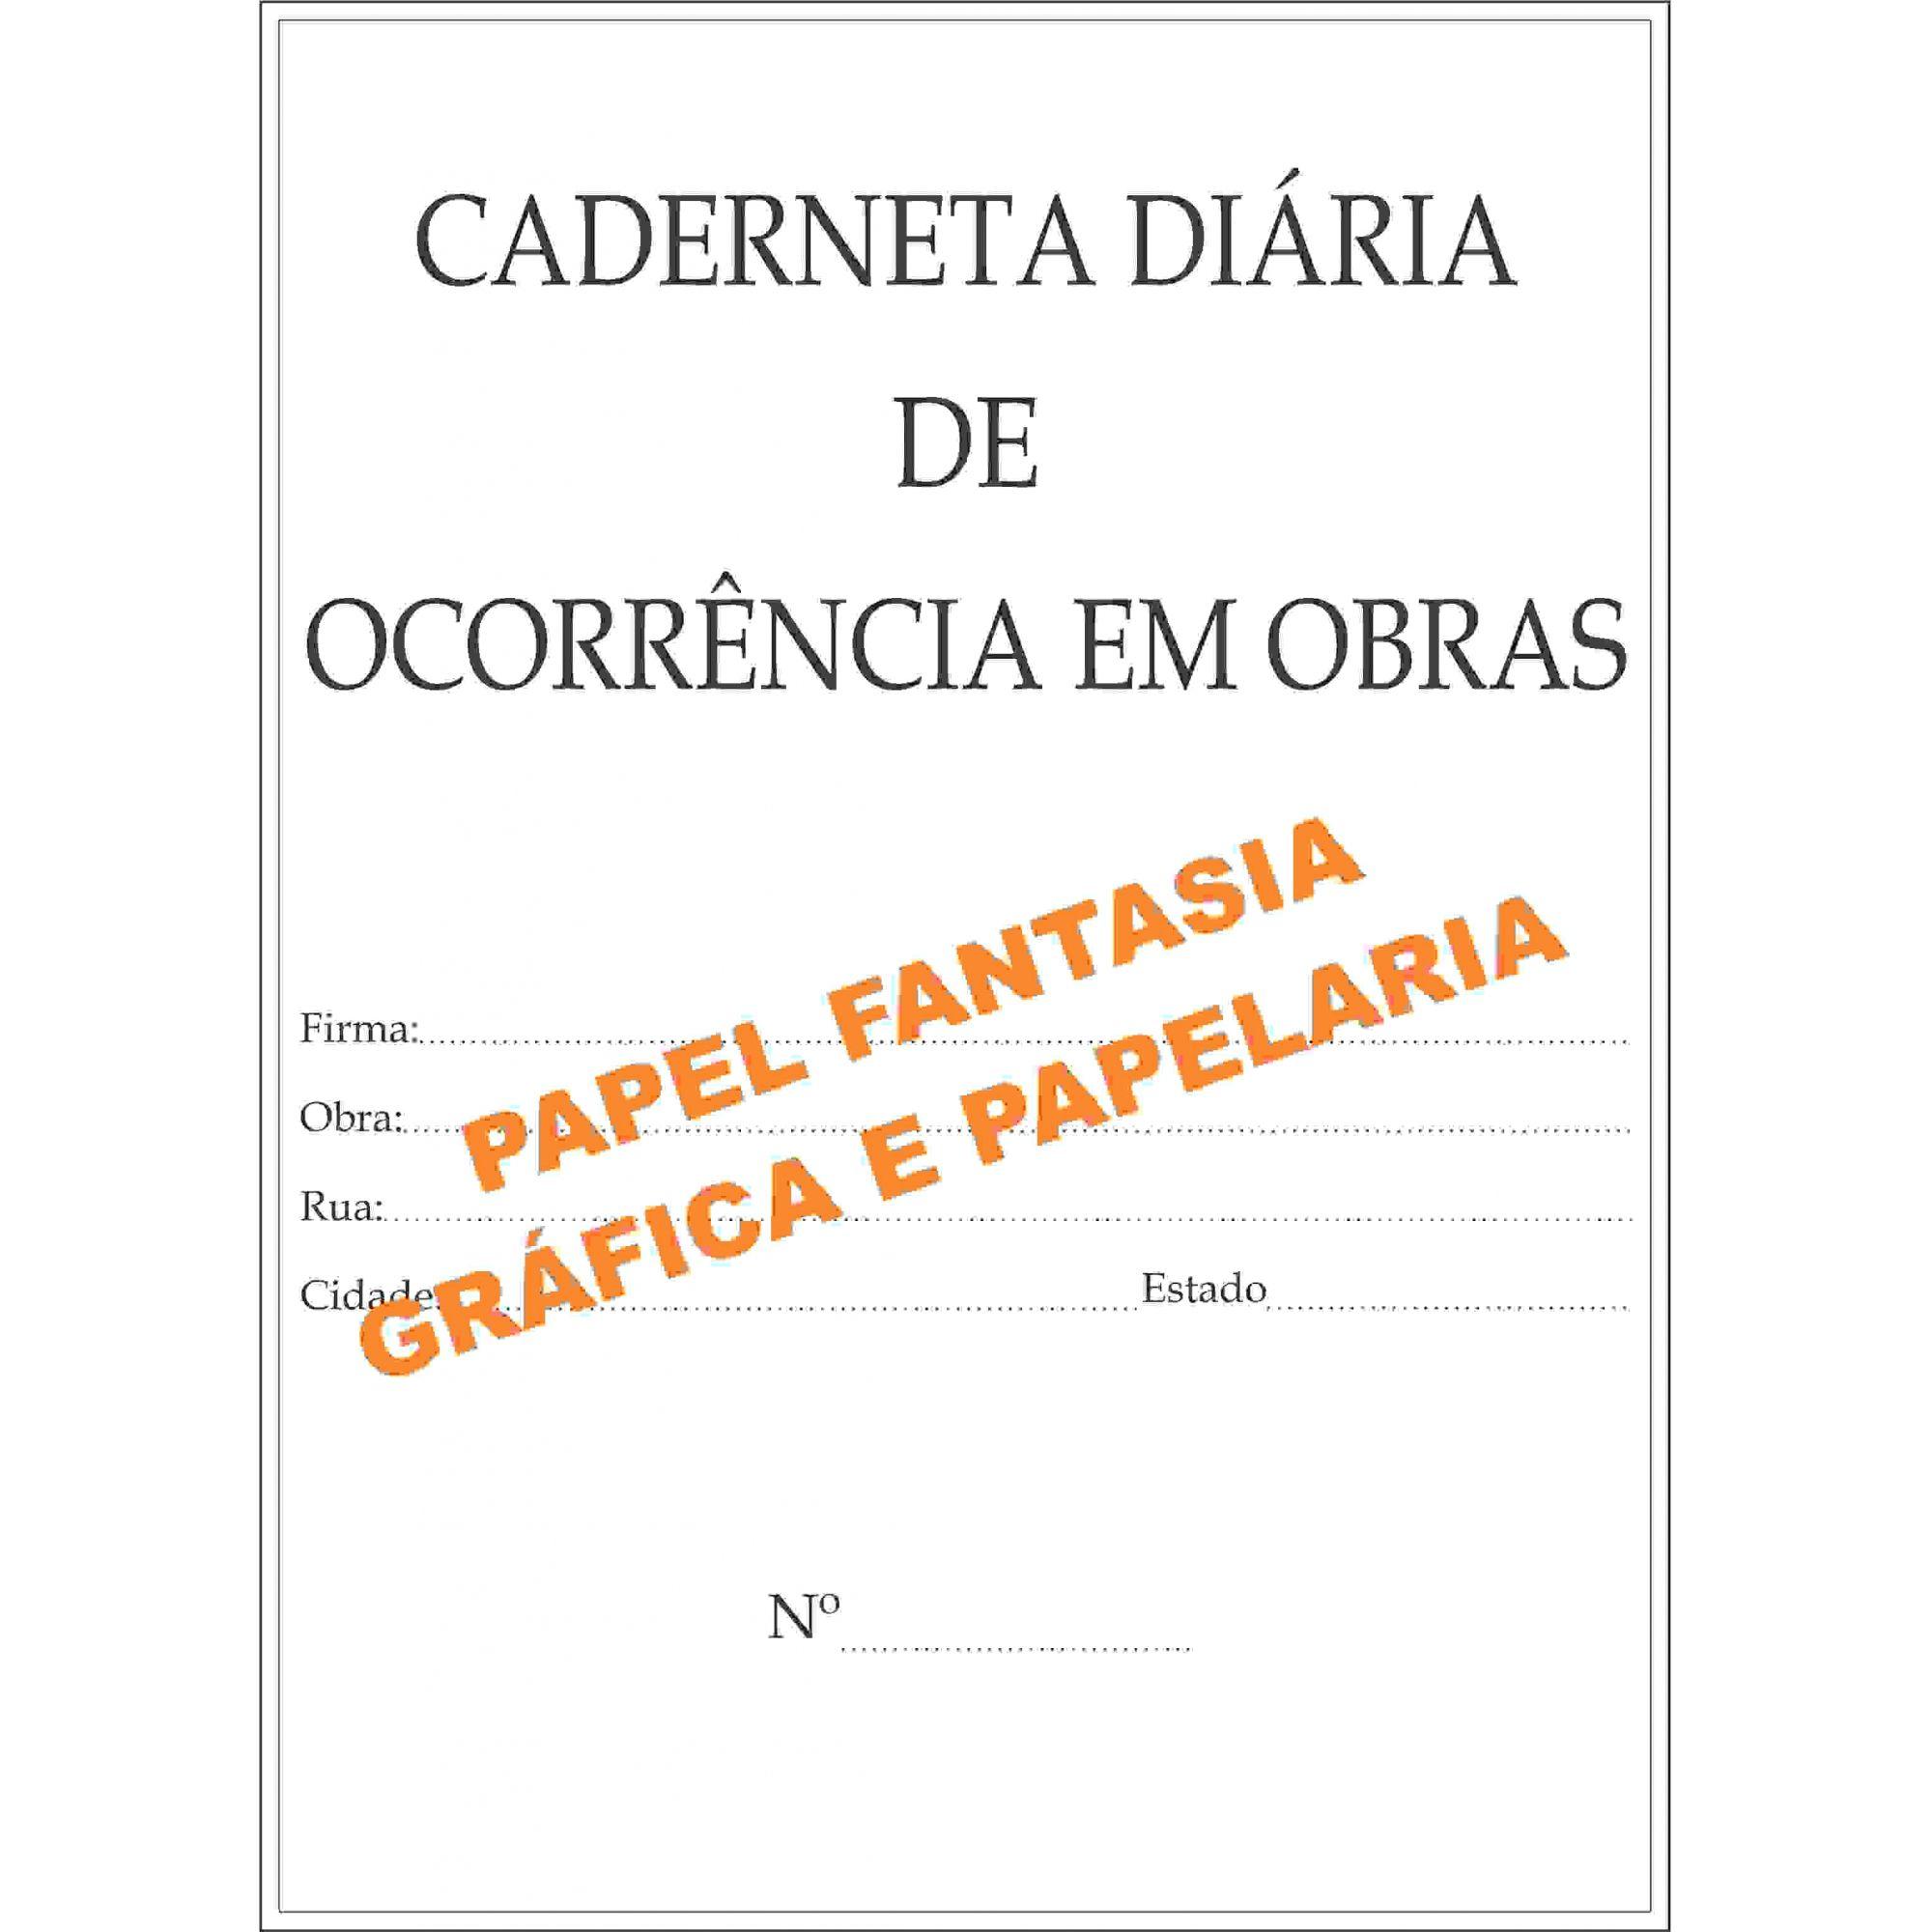 Livro Caderneta Diario de Obra 50 x 4 ( Papel Auto Copiativo )